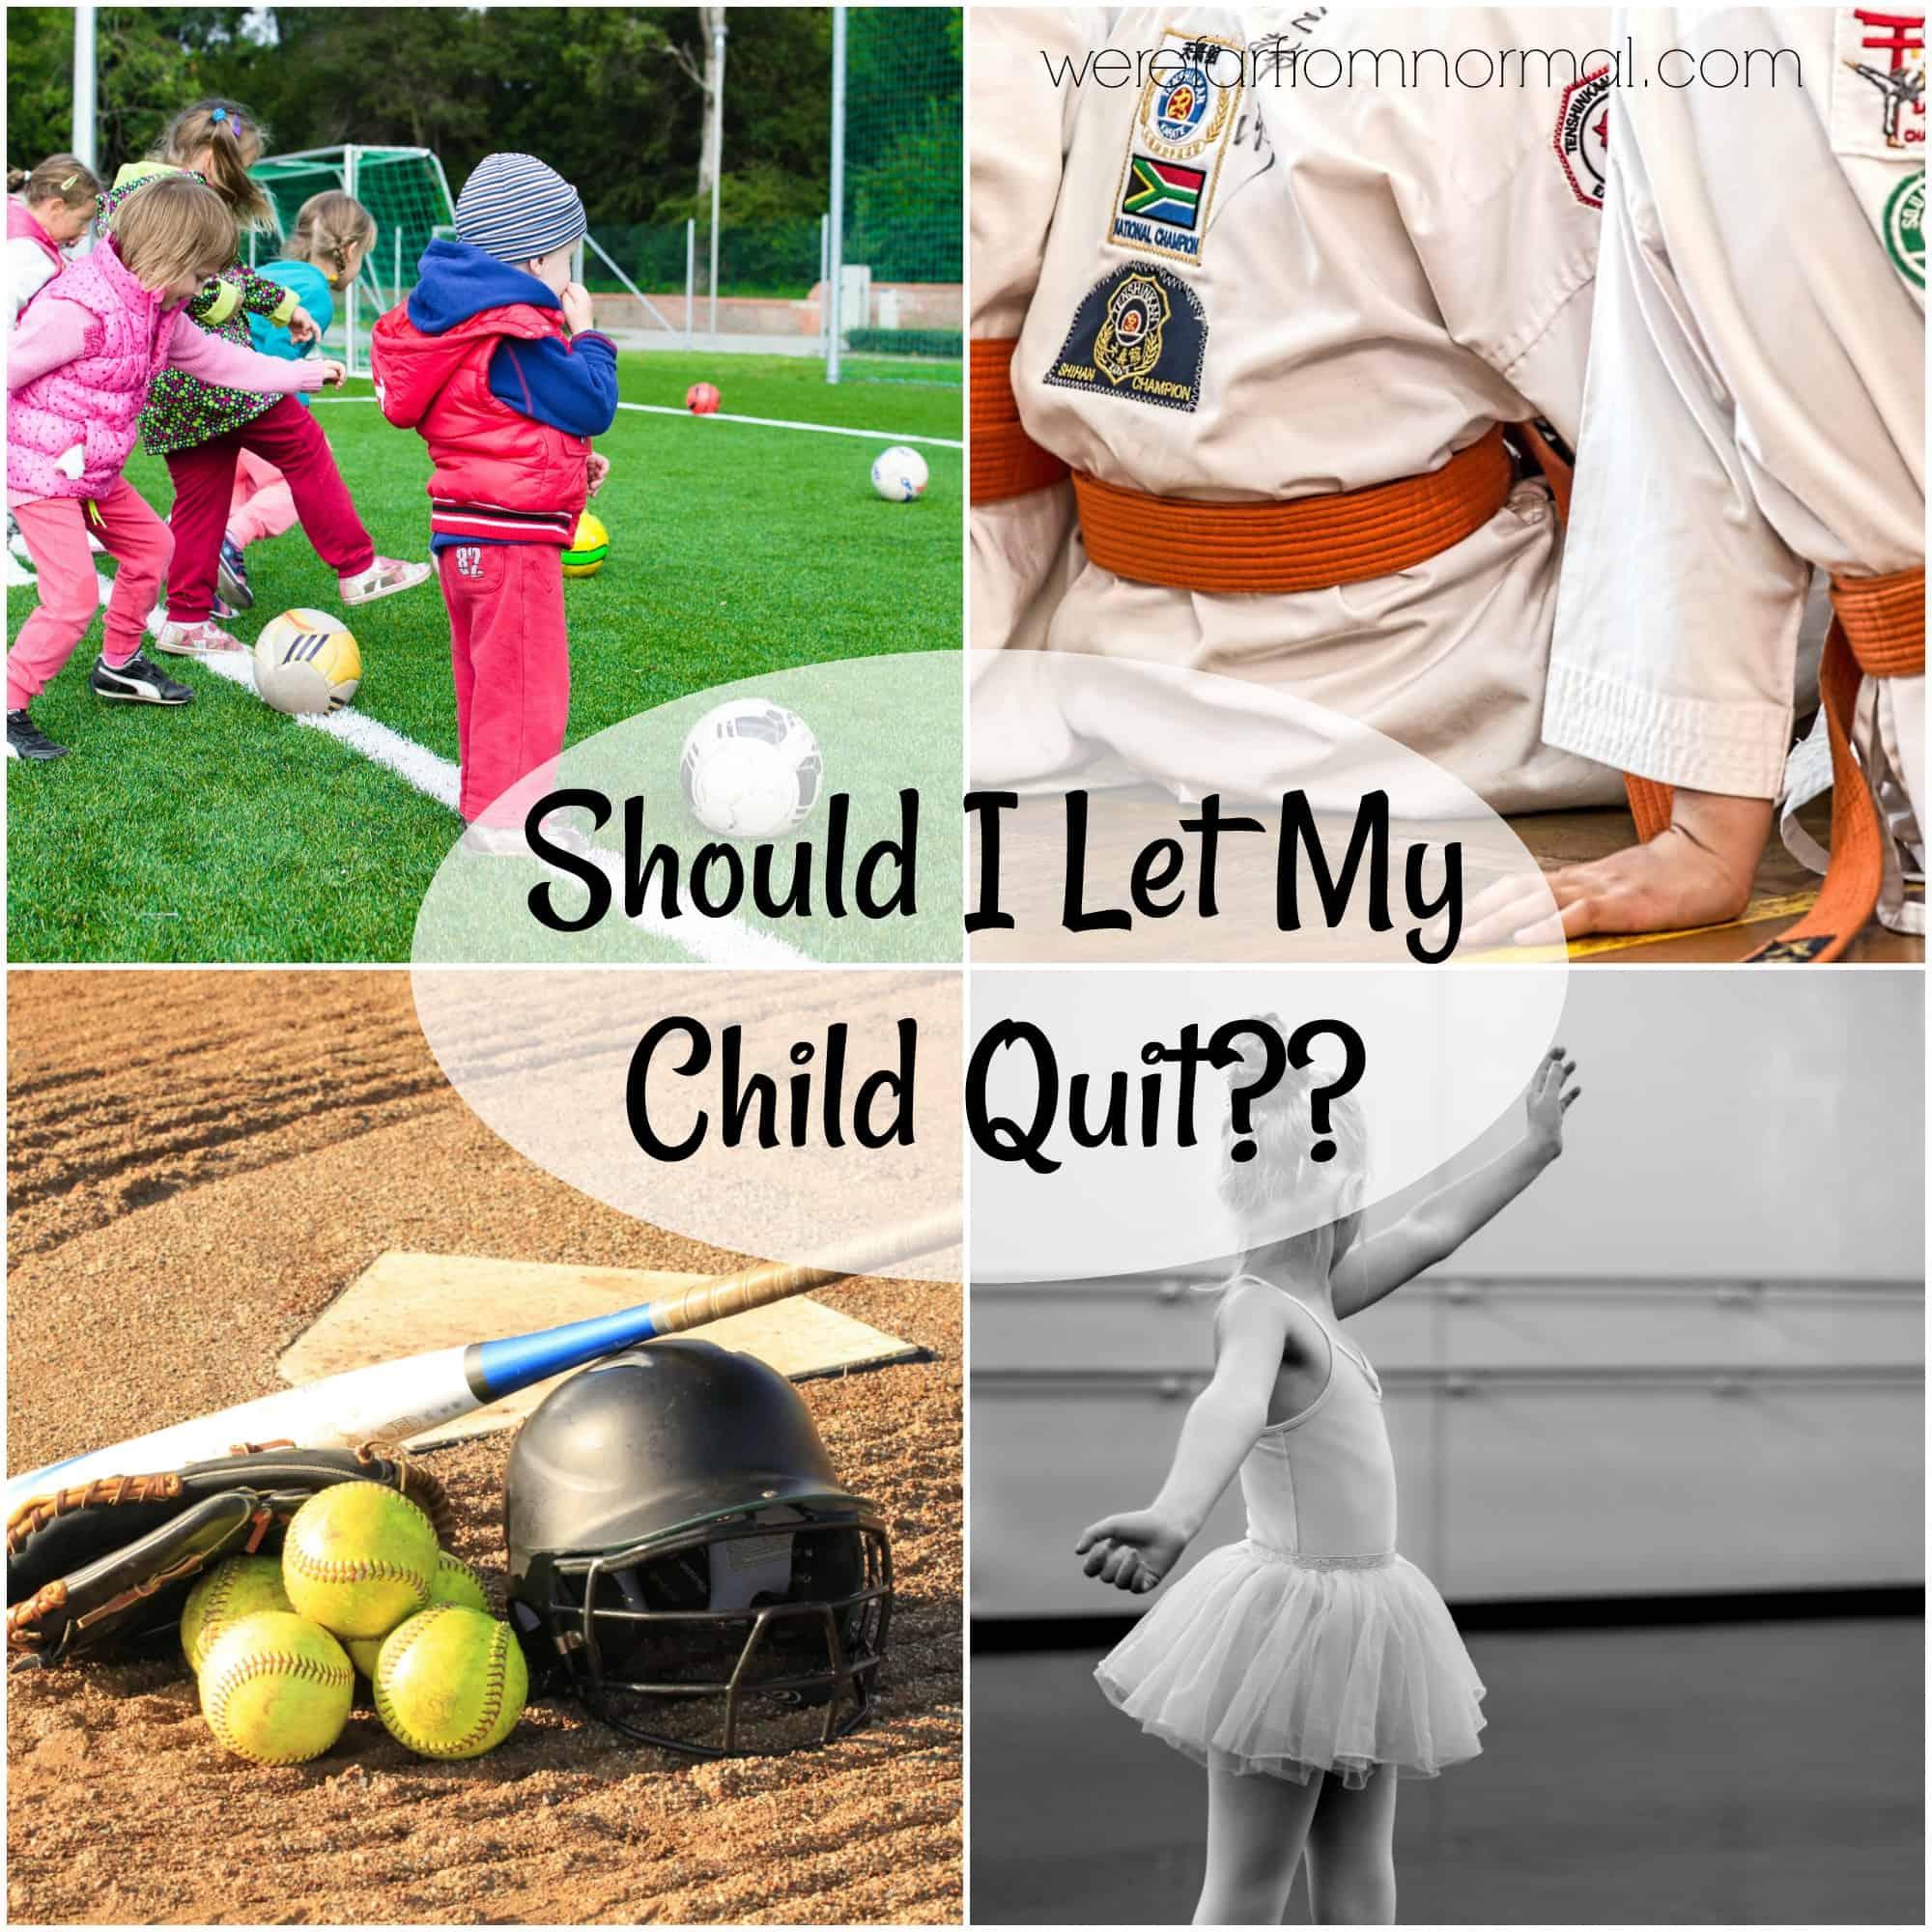 Should I Let My Child Quit??